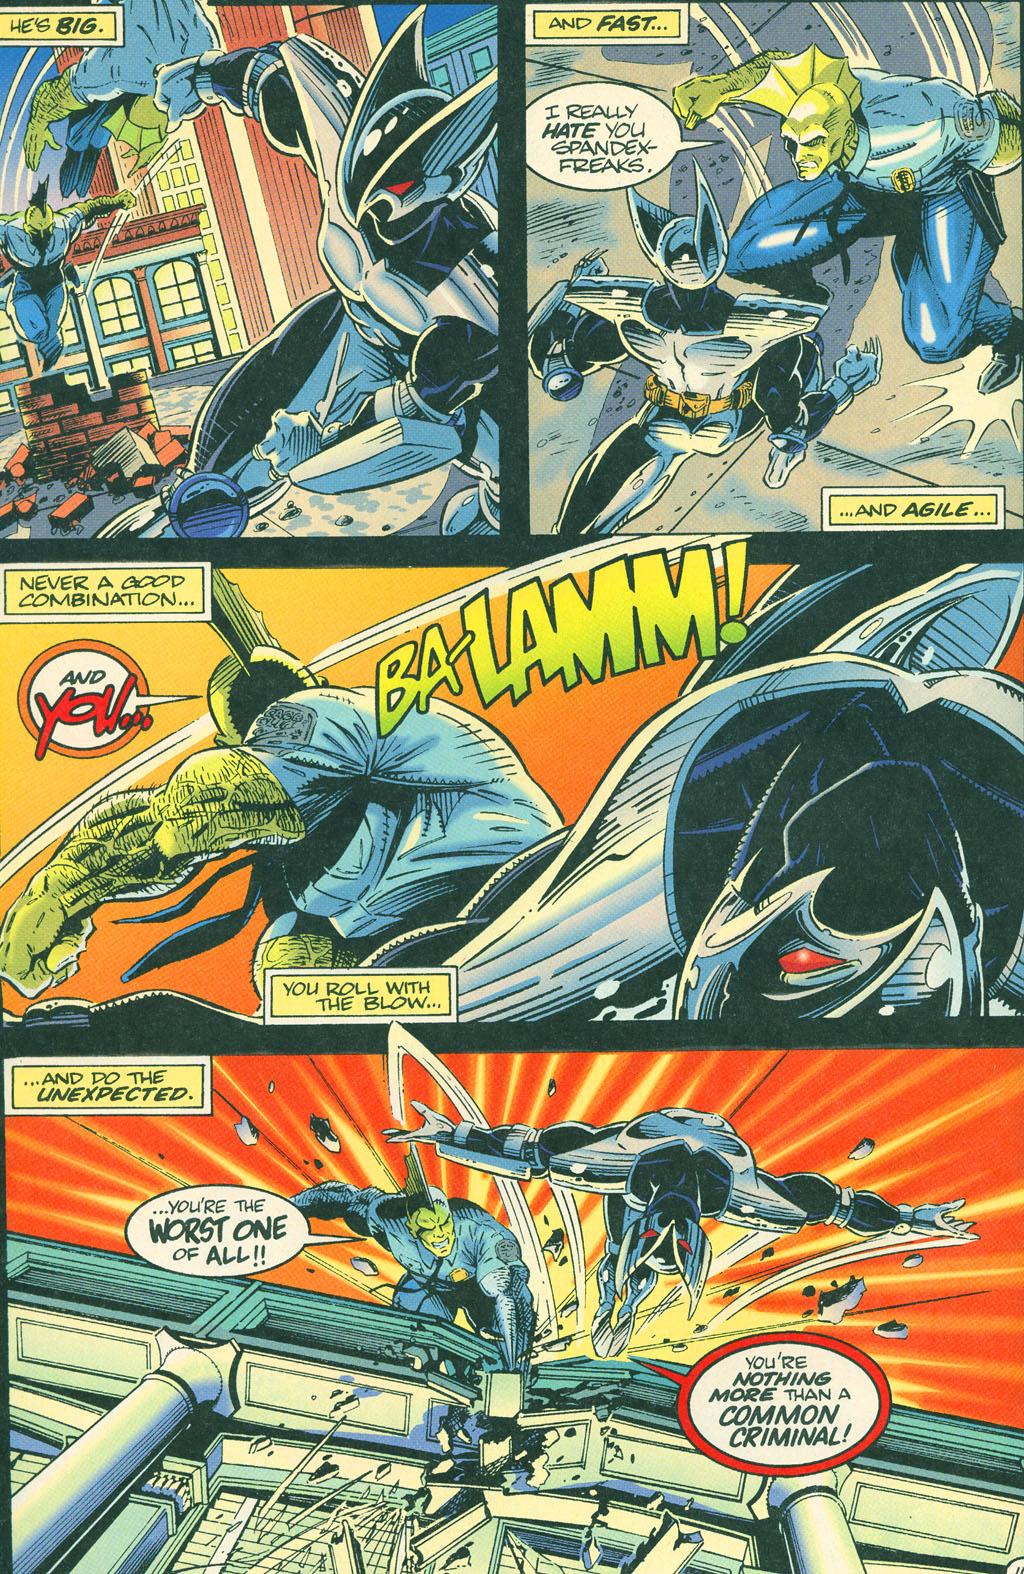 Read online ShadowHawk comic -  Issue #4 - 18